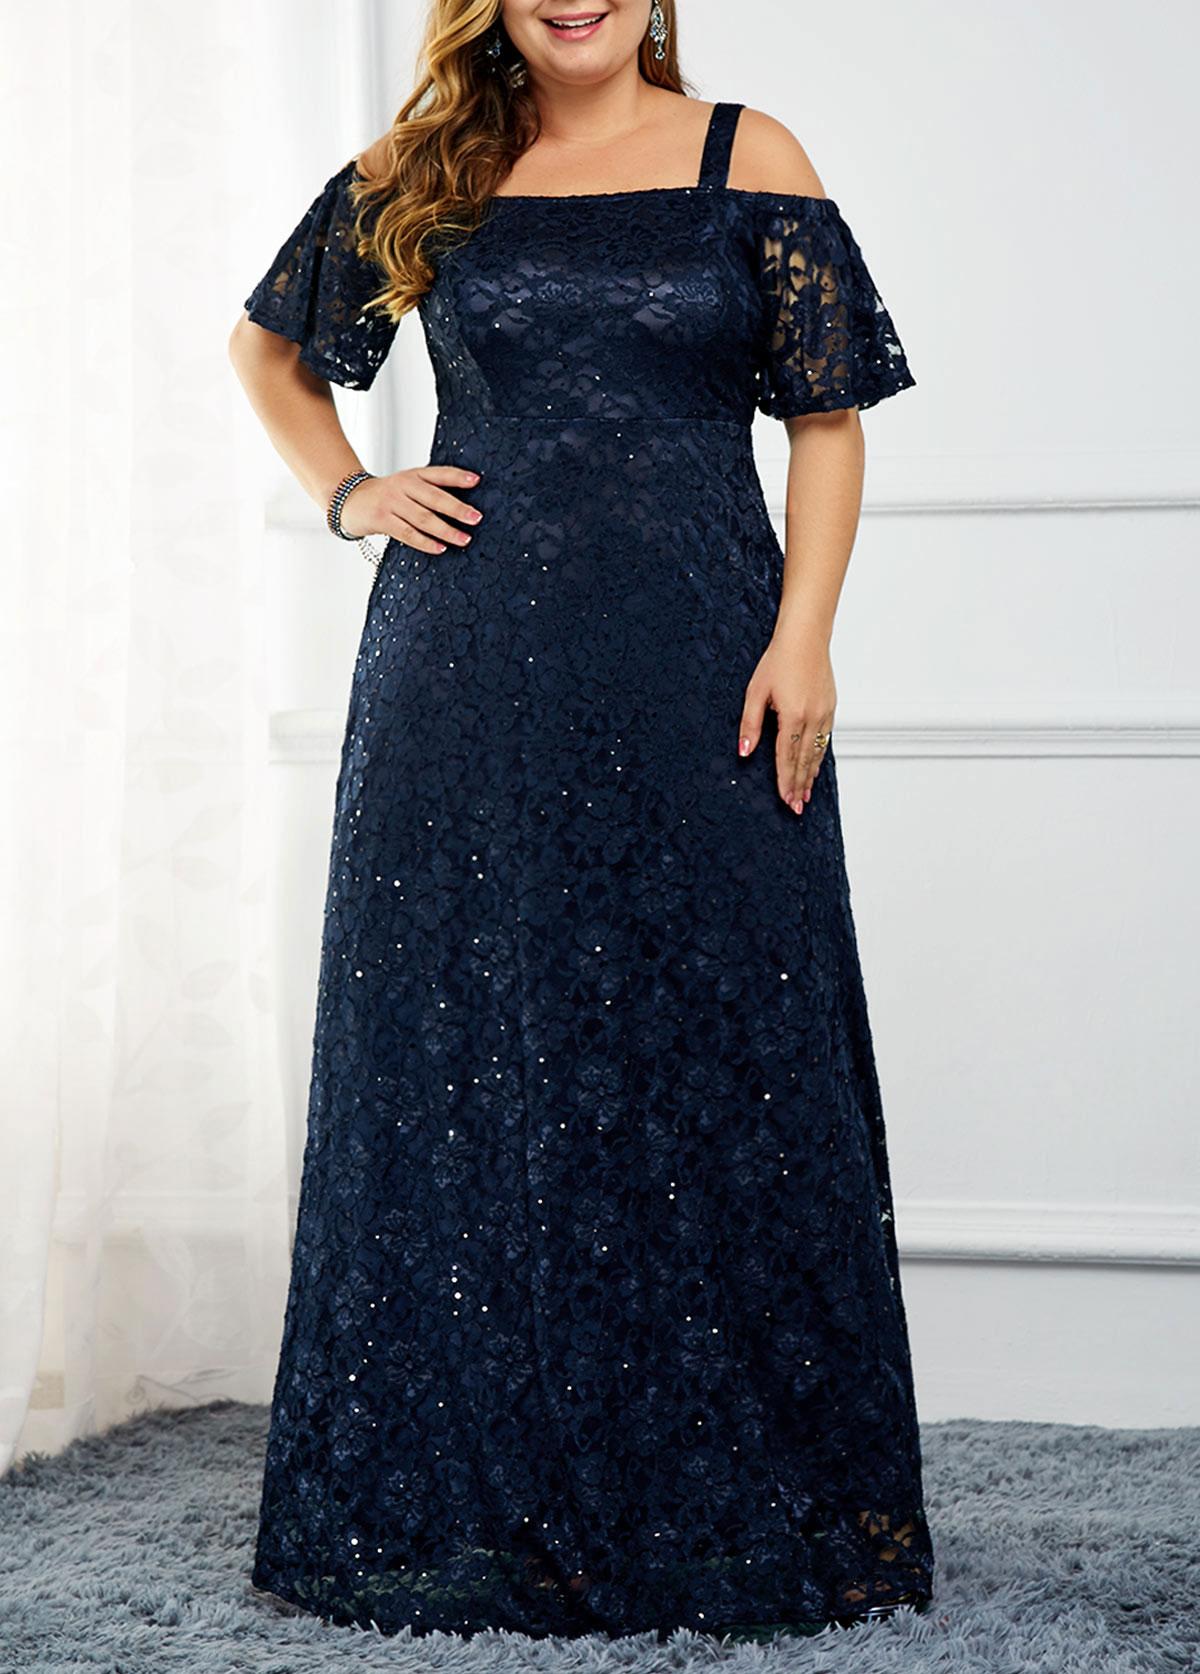 ROTITA Strappy Cold Shoulder Back Zipper Sequin Detail Lace Dress